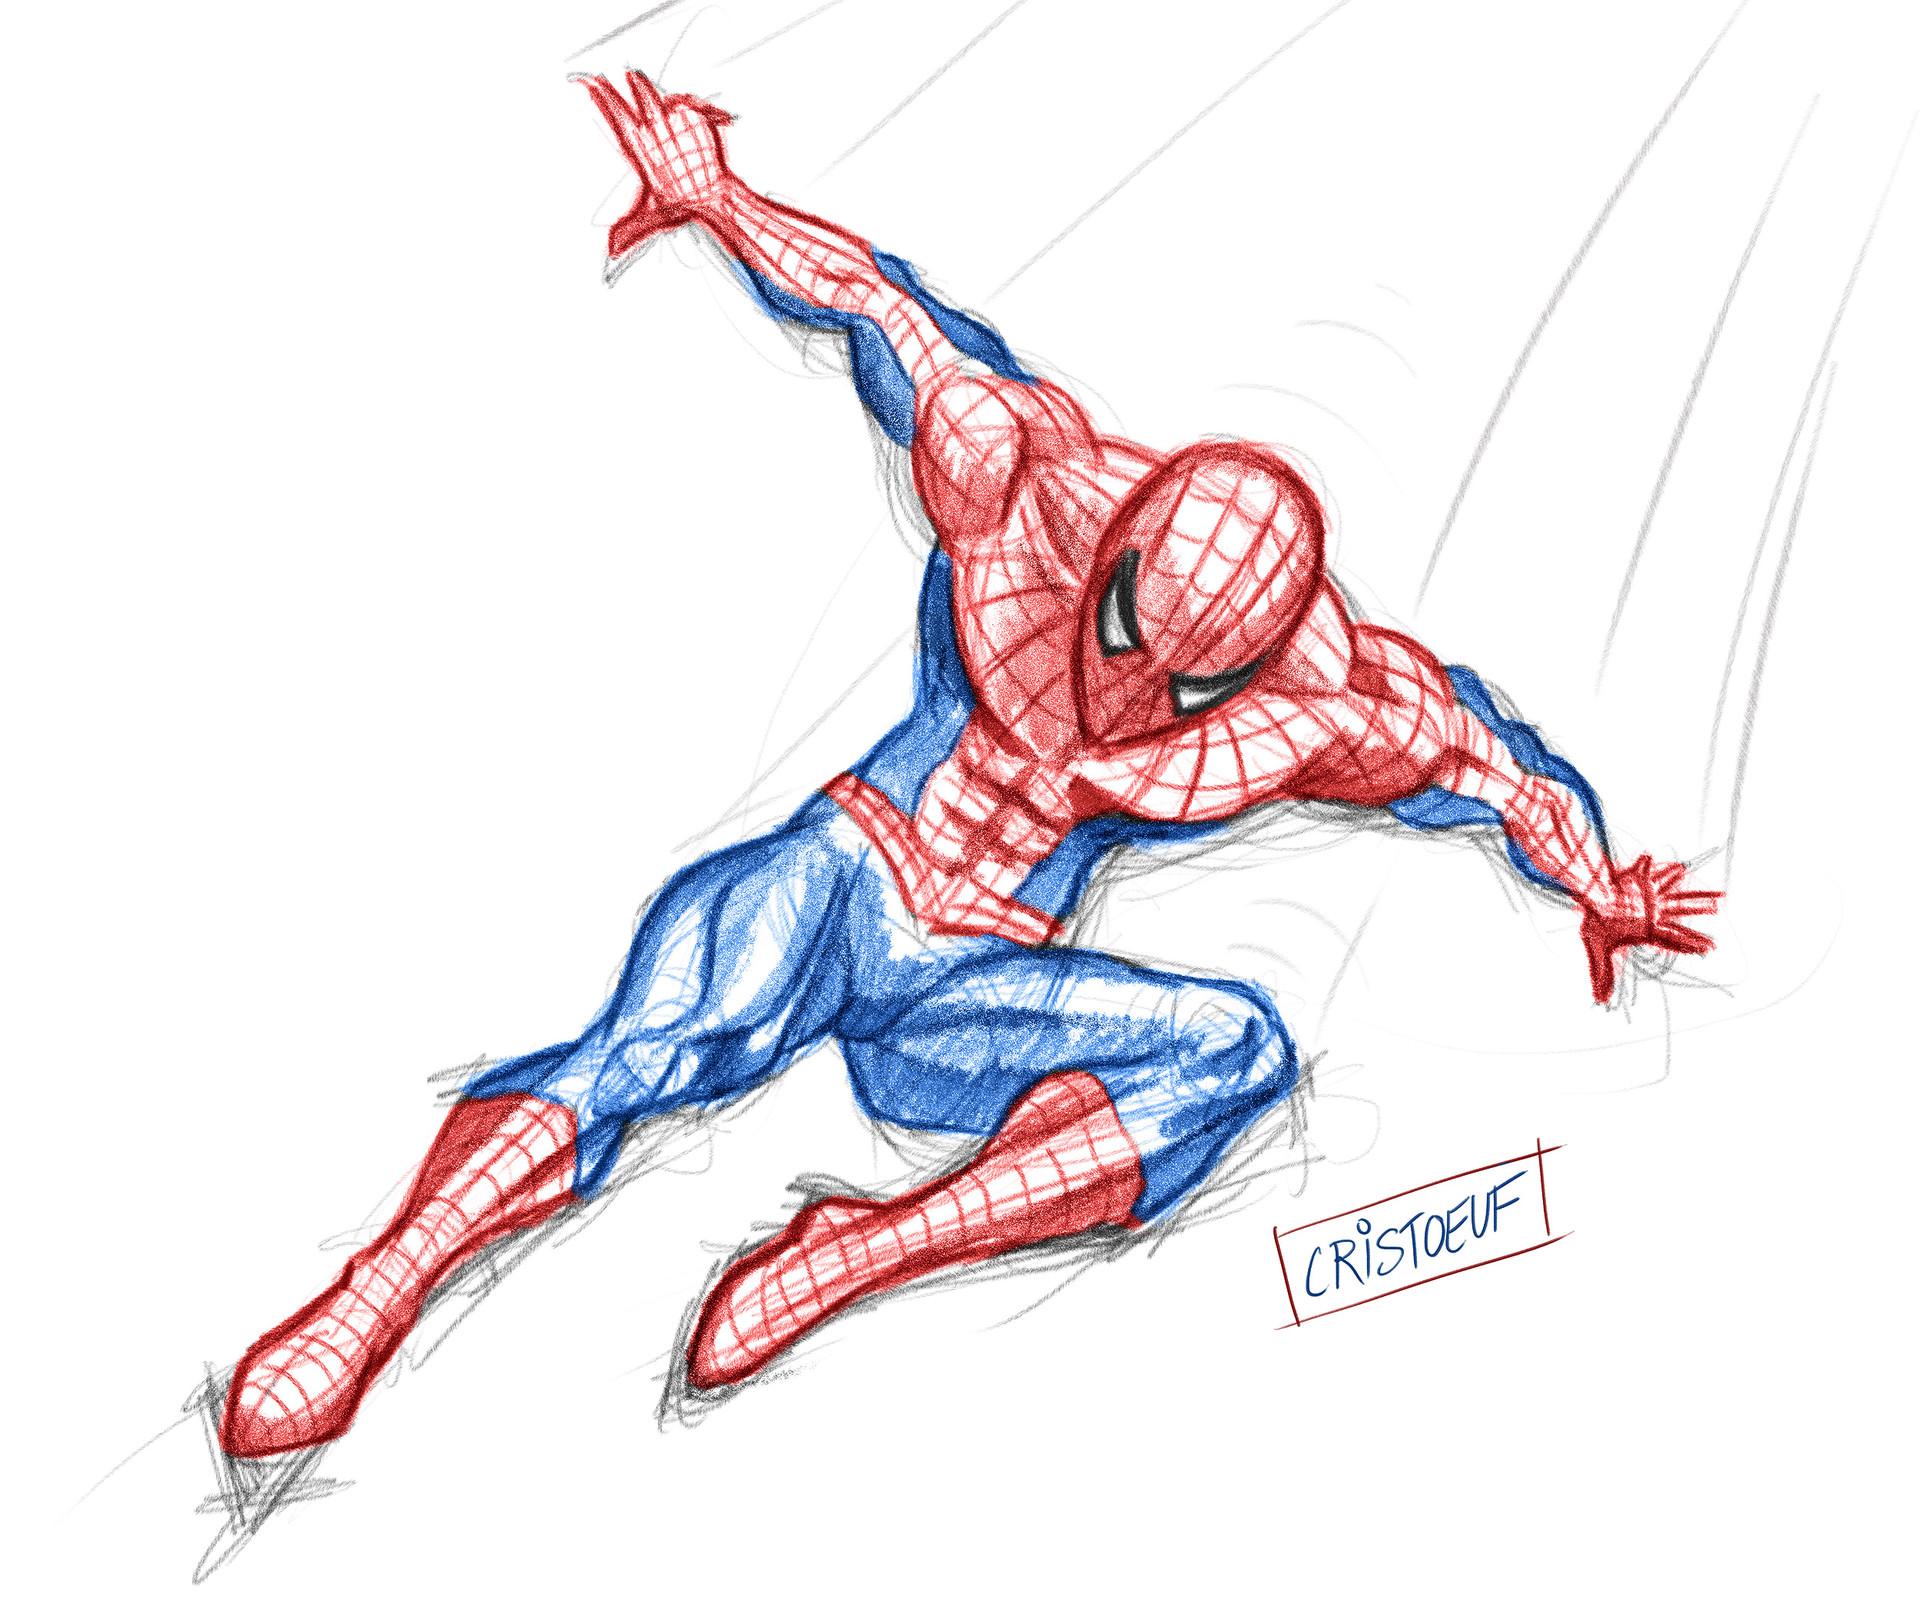 Spiderman pencil drawing free download best spiderman pencil